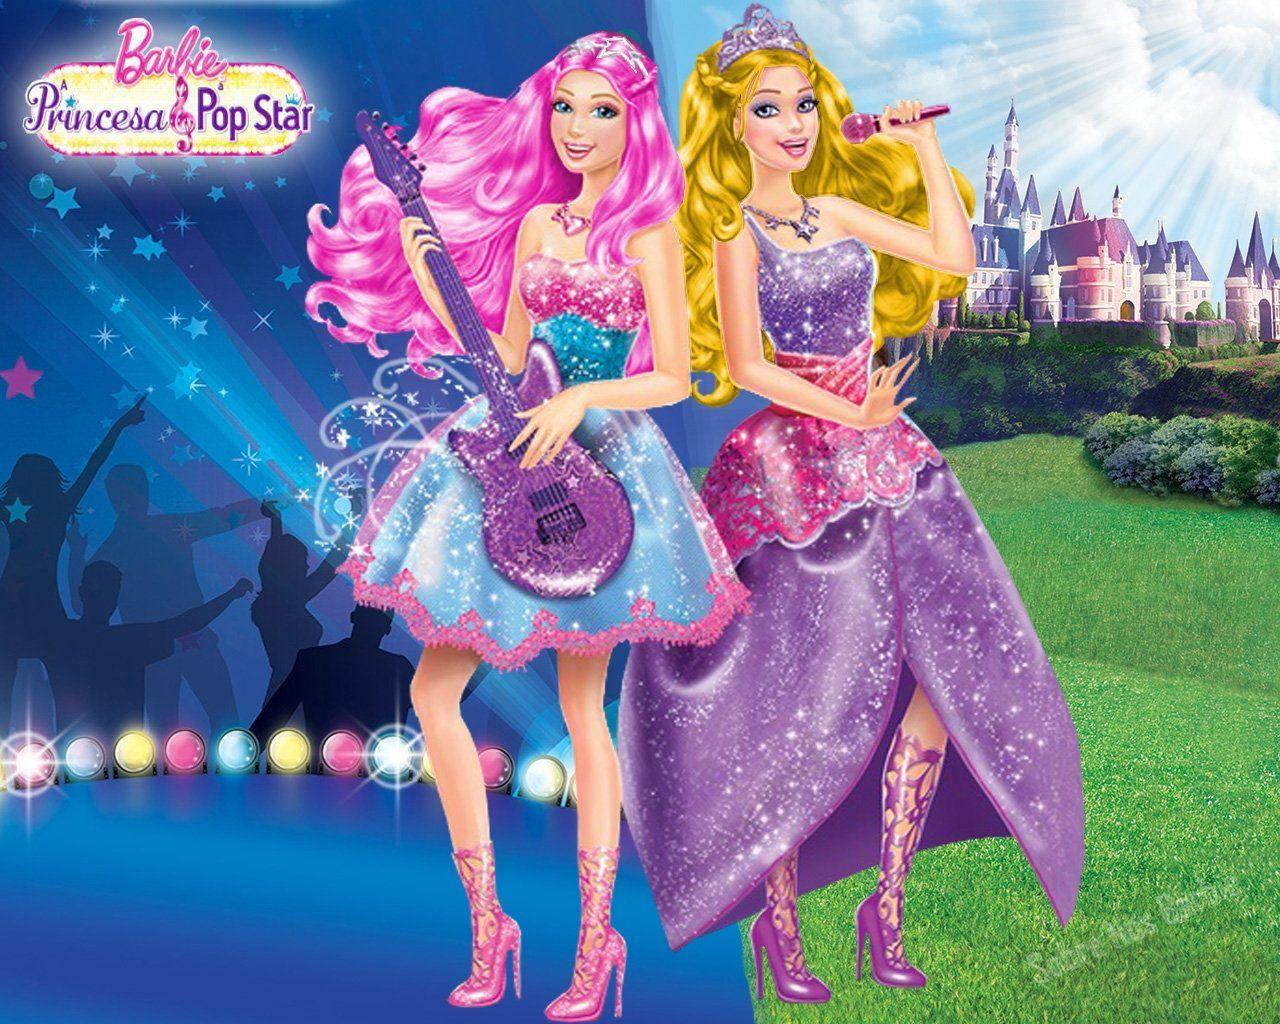 Barbie Doll Princesa Pop Star Wallpaper Wallpaper in 2020